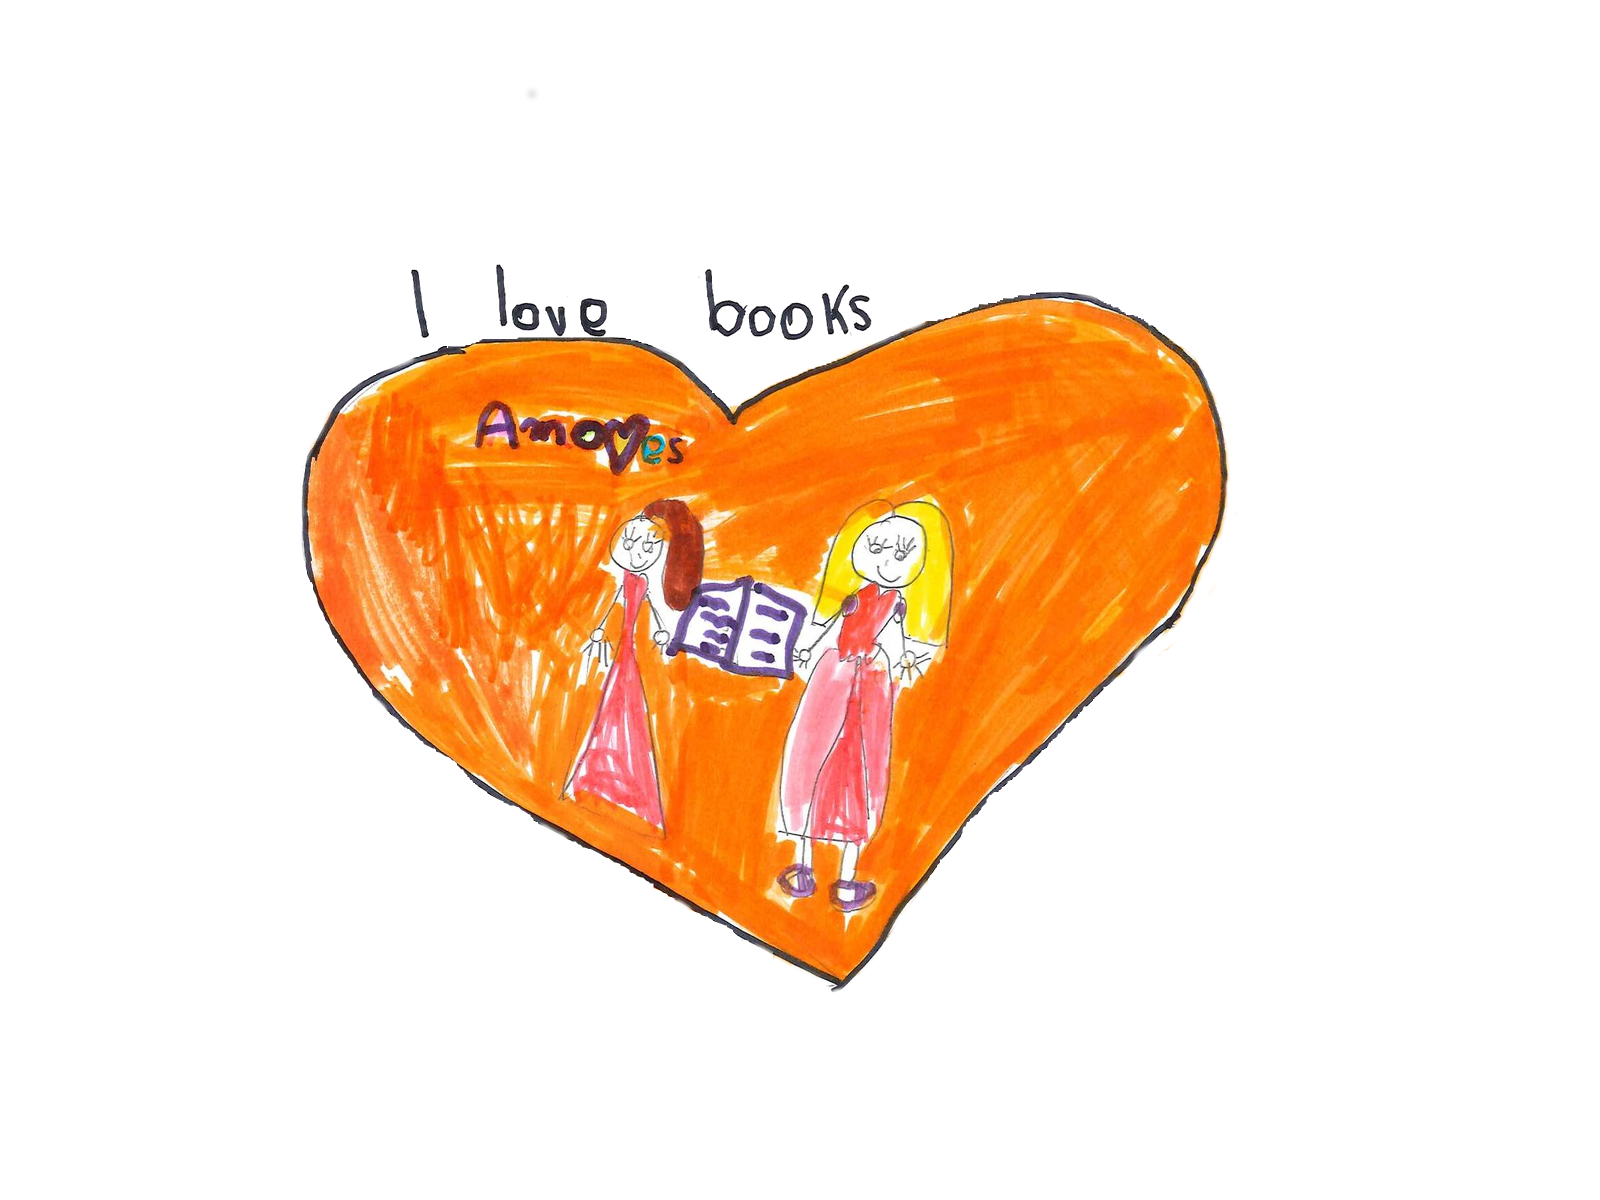 AMORES logo